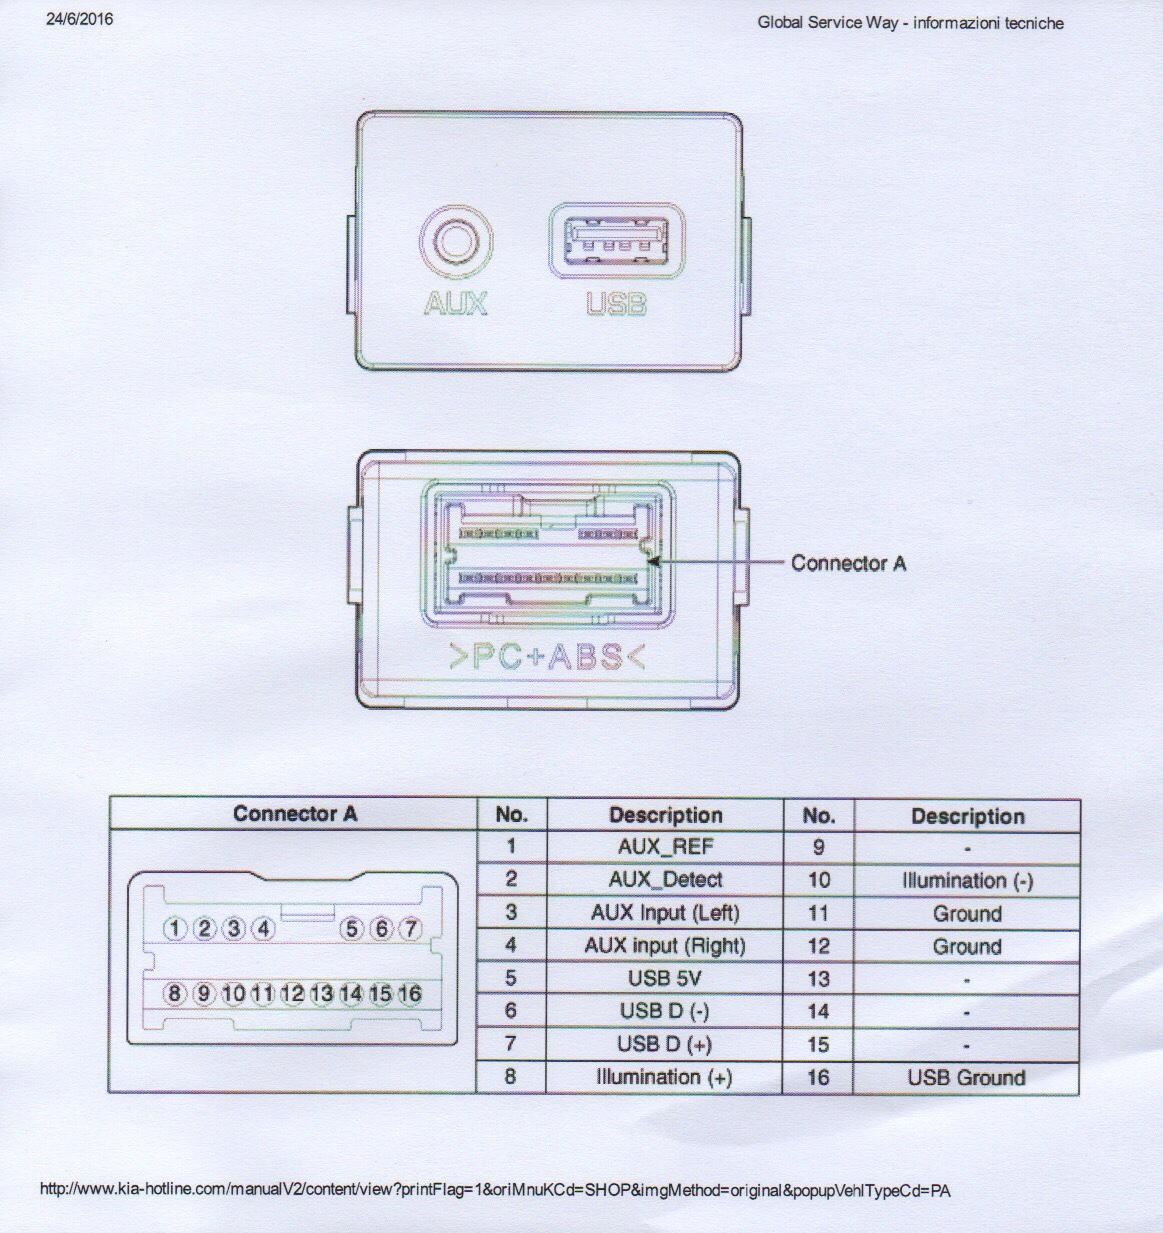 Schema Elettrico Usb : Schema elettrico presa aux usb new sportage manuali